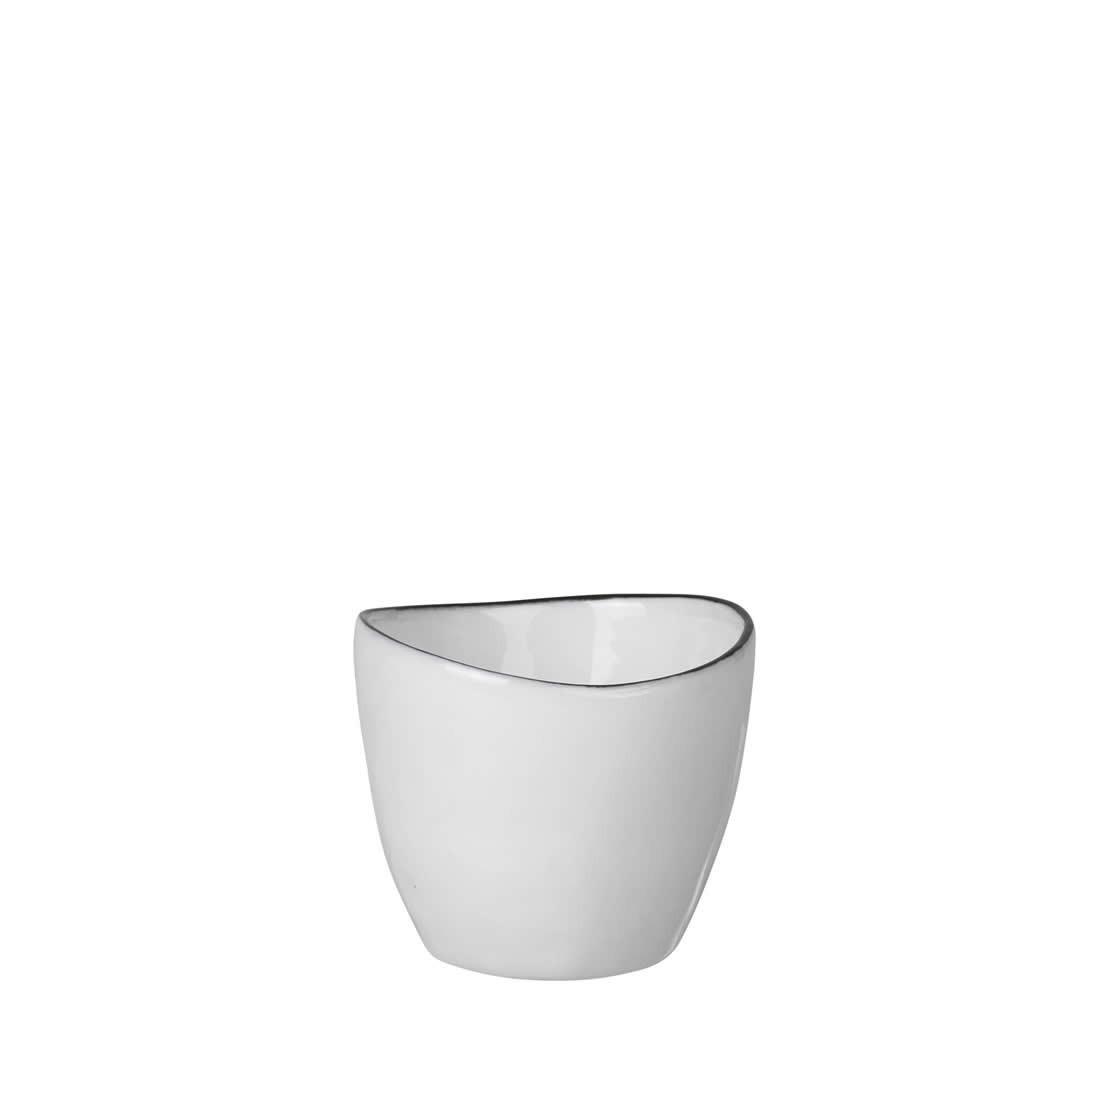 broste salt eierdop porselein. Black Bedroom Furniture Sets. Home Design Ideas